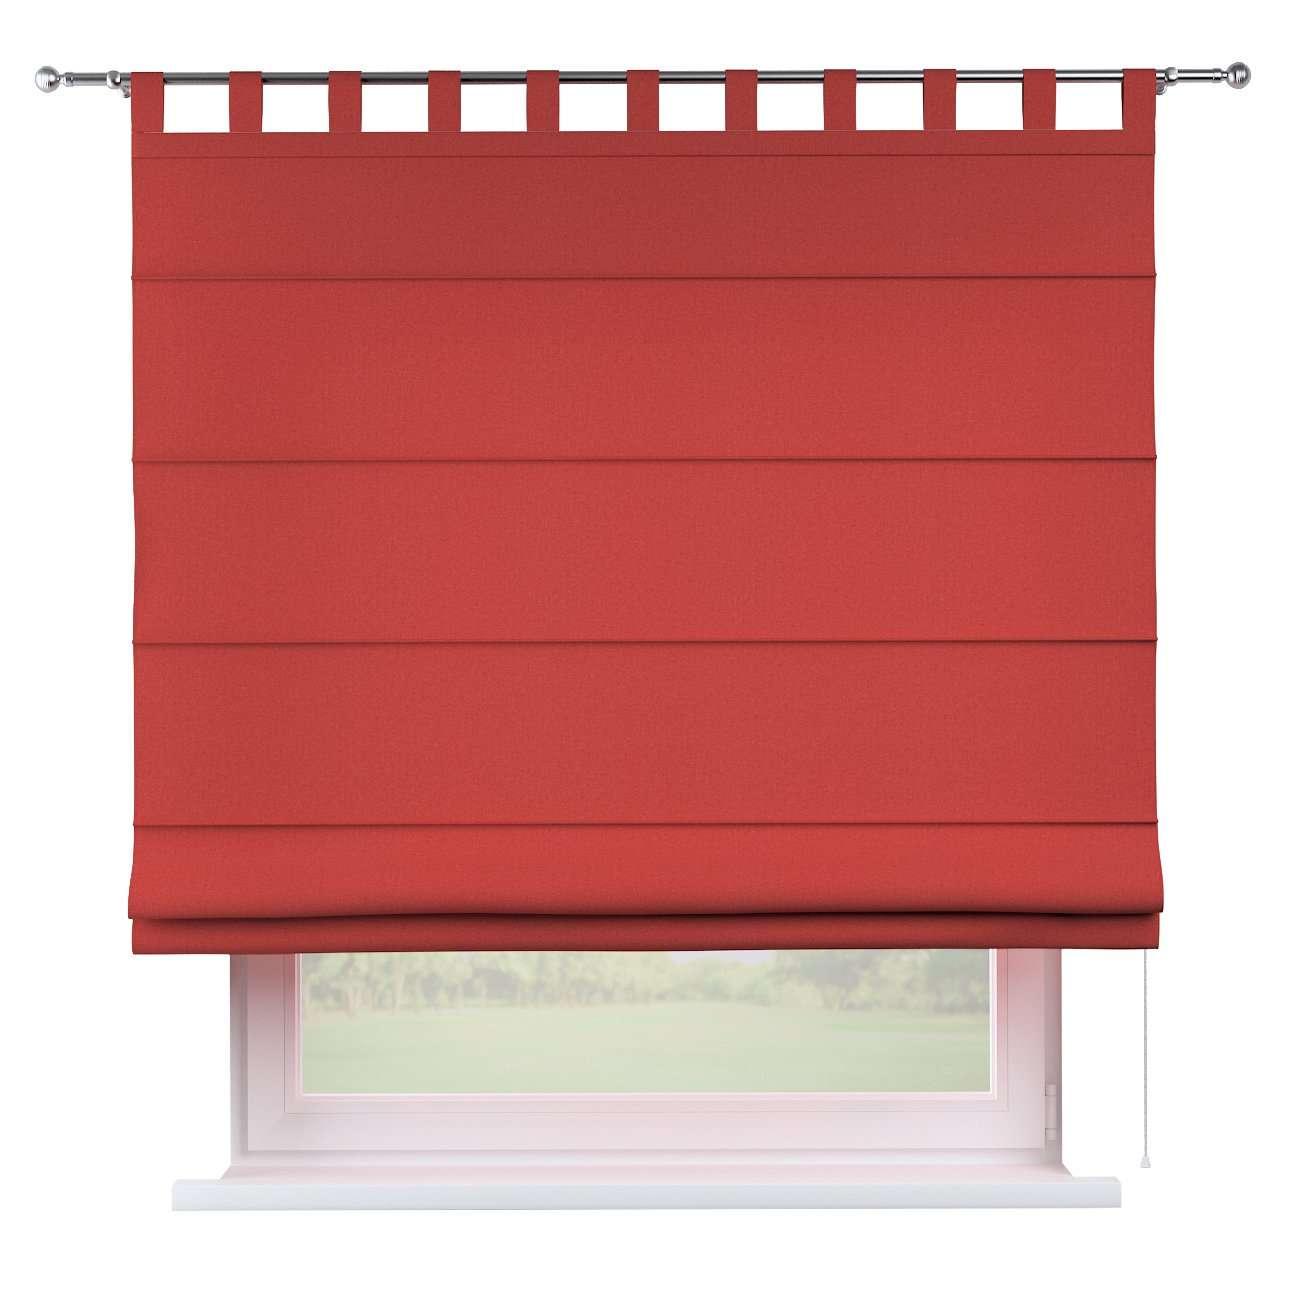 raffrollo verona rot 100 170 cm wooly dr werhahn. Black Bedroom Furniture Sets. Home Design Ideas